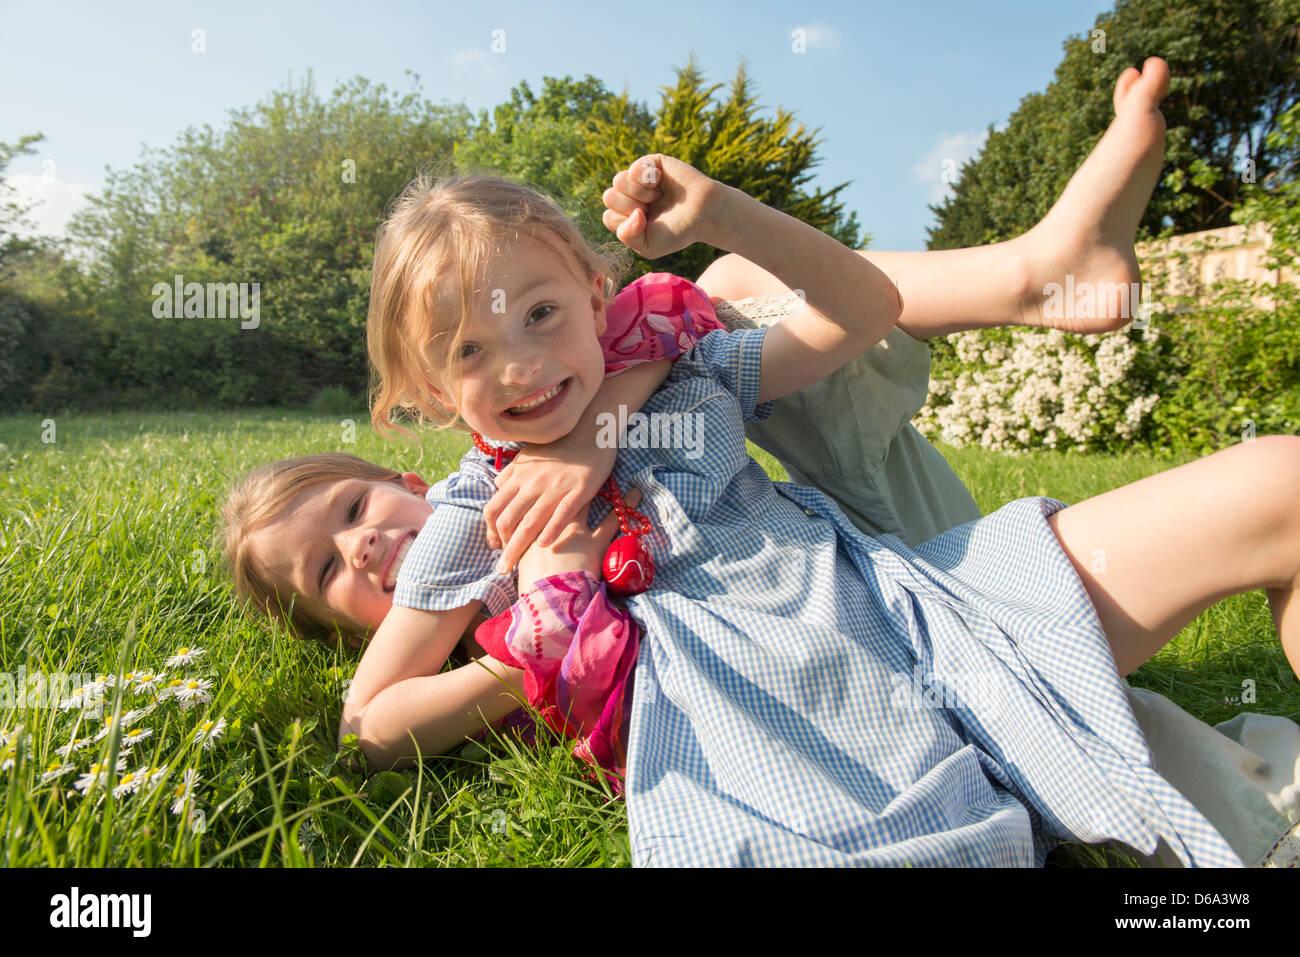 Les filles jouent ensemble in grassy field Photo Stock